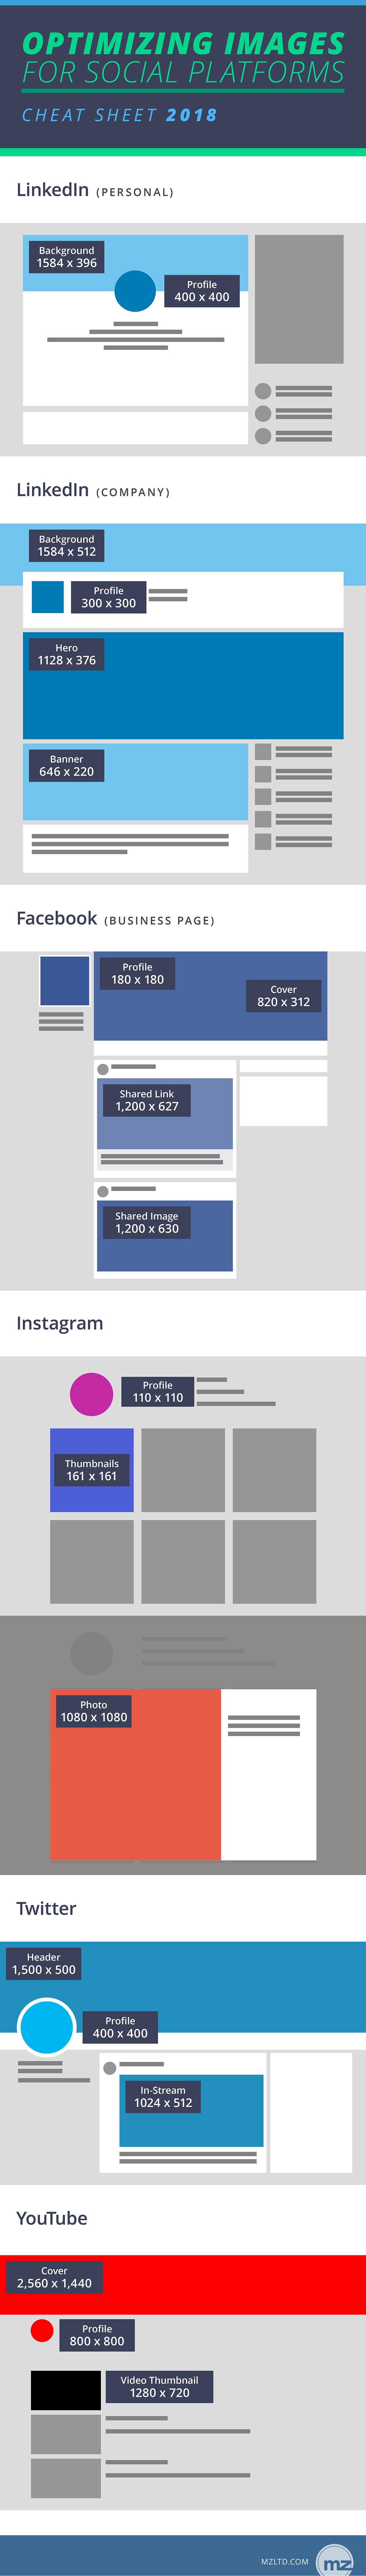 Cheat sheet for social media image optimization